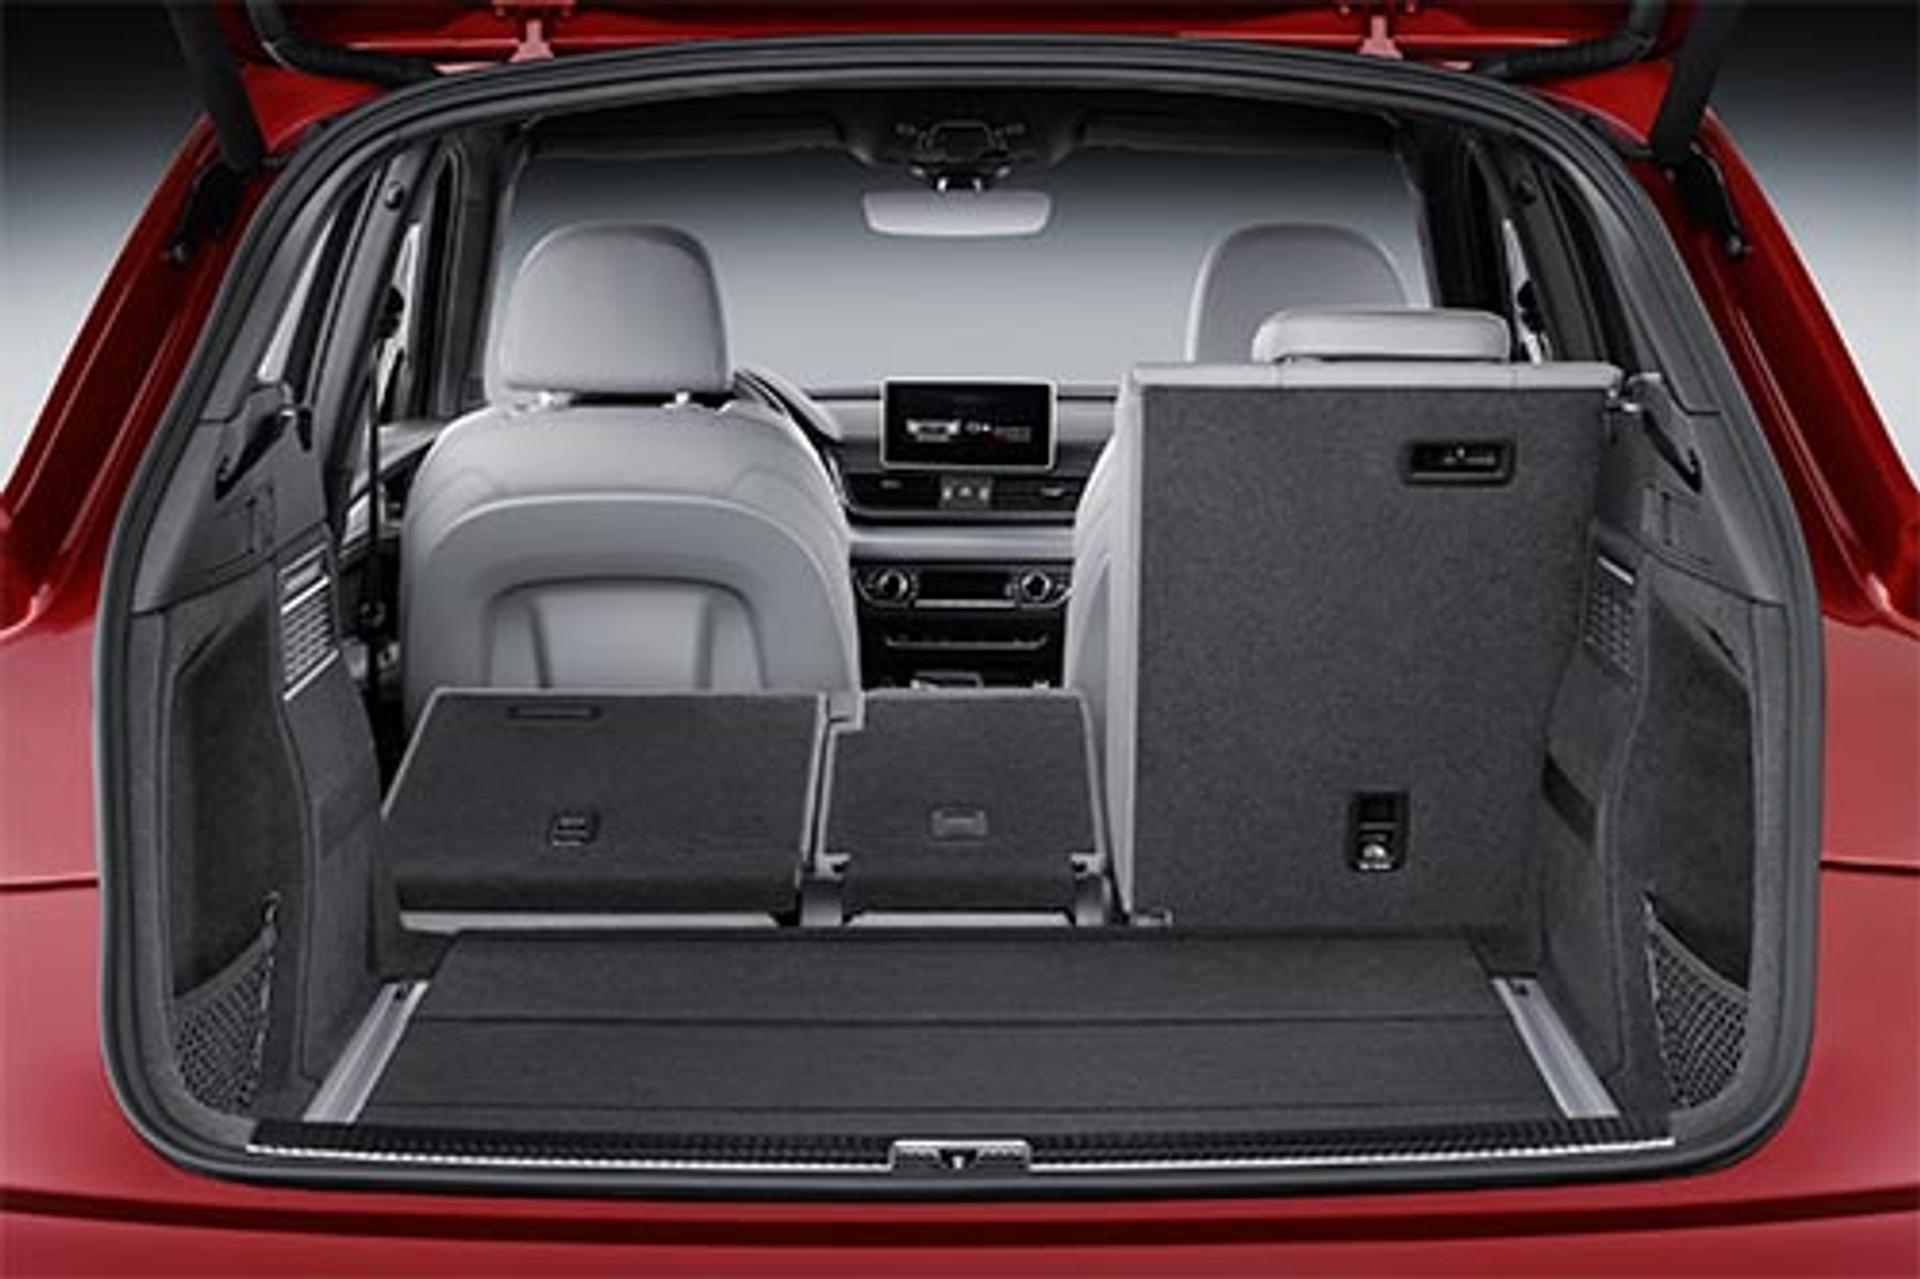 Audi Q5 split folding rear seats